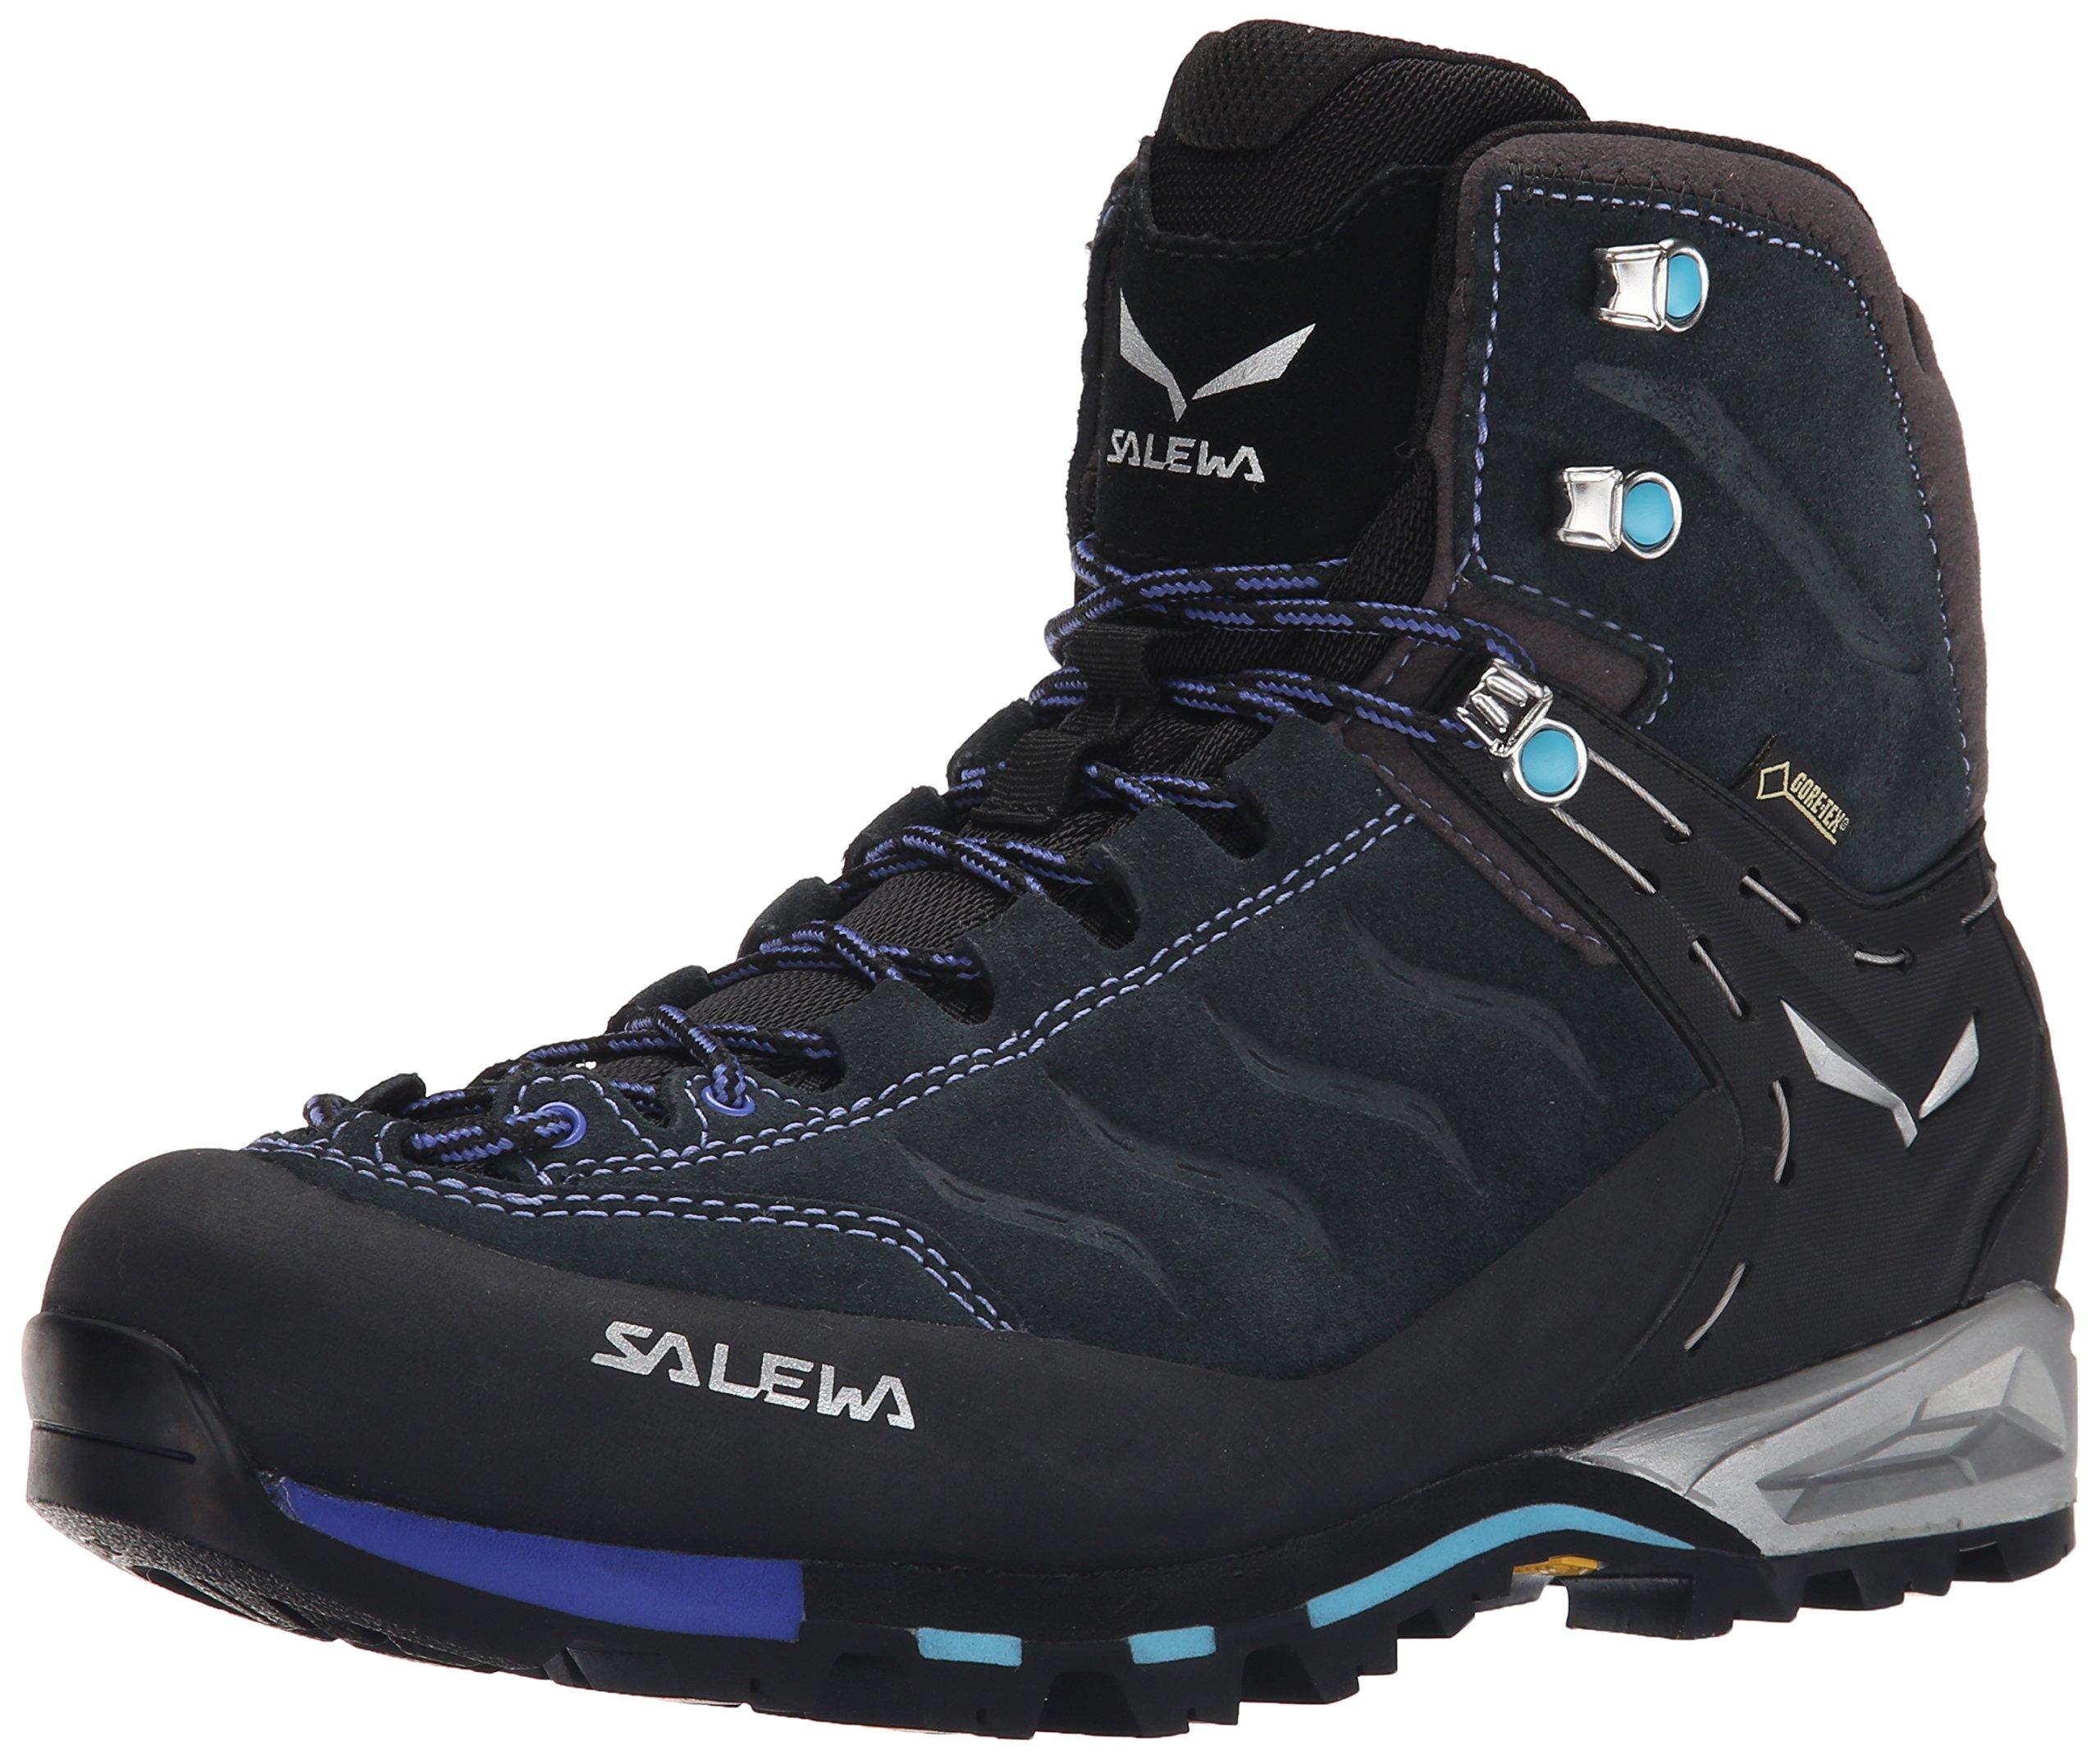 Salewa Women's WS MTN Trainer Mid GTX Hiking Shoe, Carbon/River Blue, 8 M US